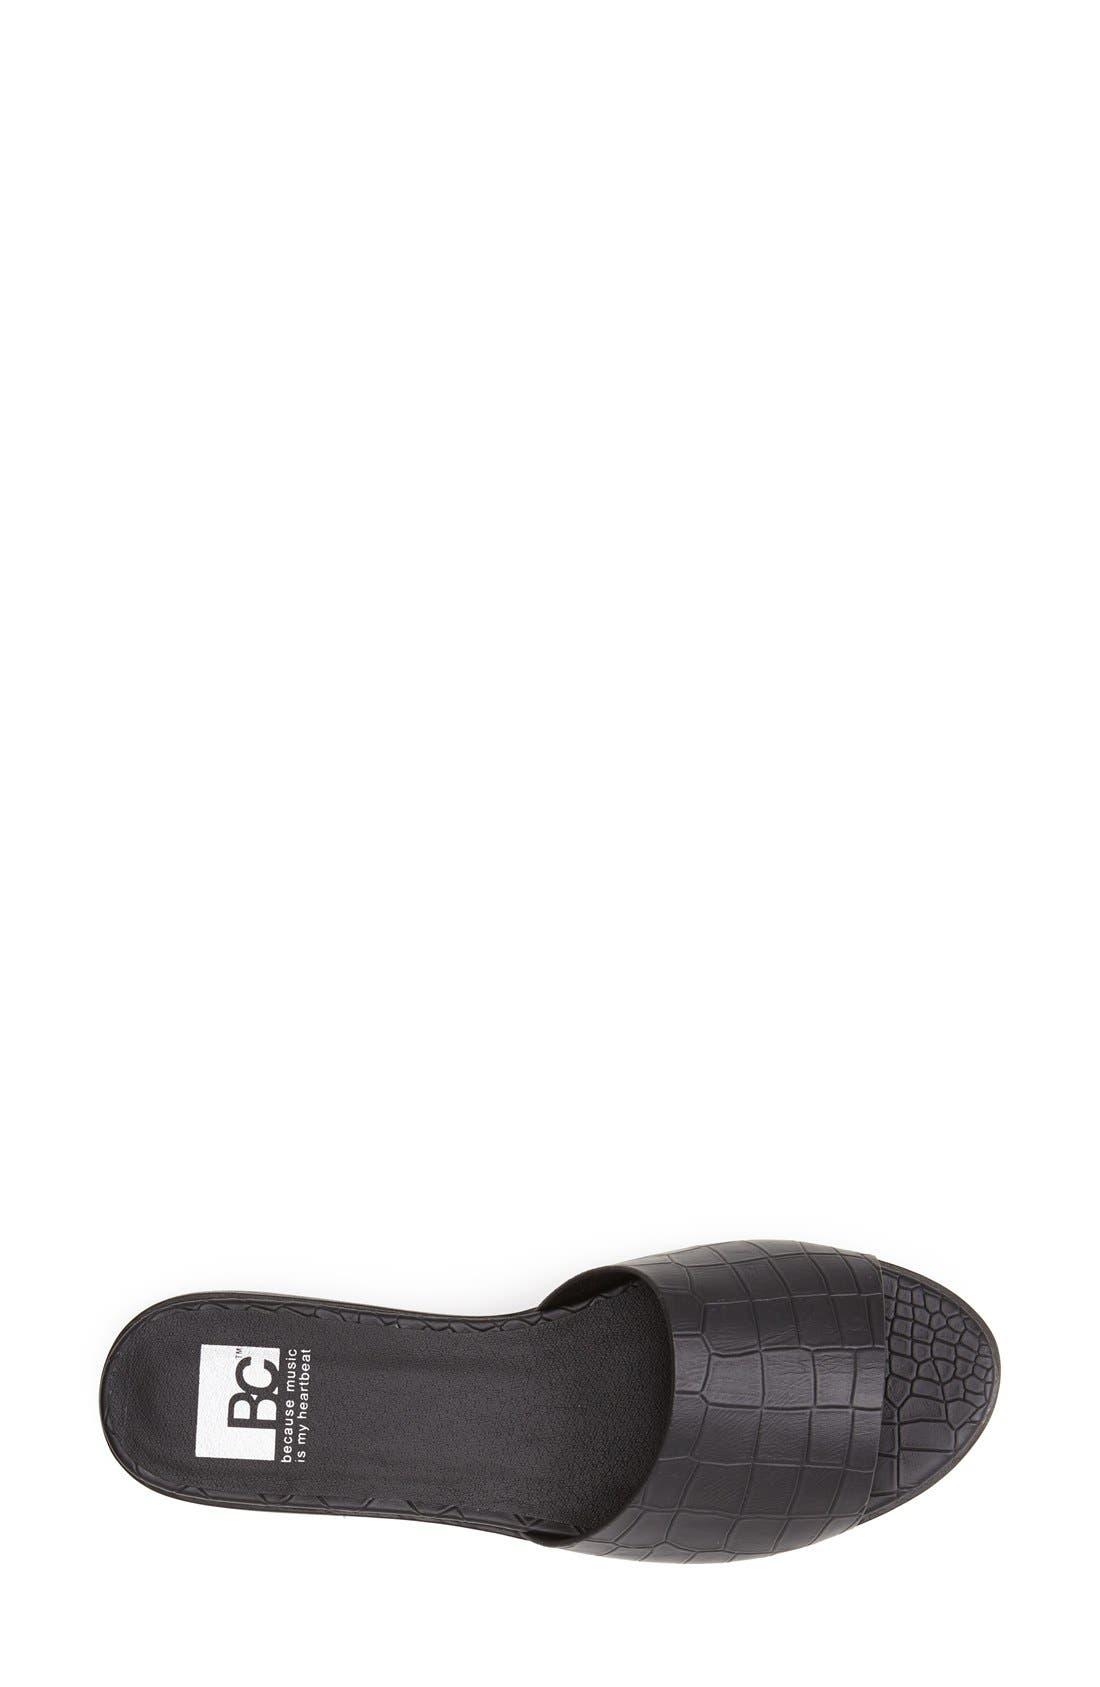 Alternate Image 3  - BC Footwear 'Inspiration' Slide Sandal (Women)